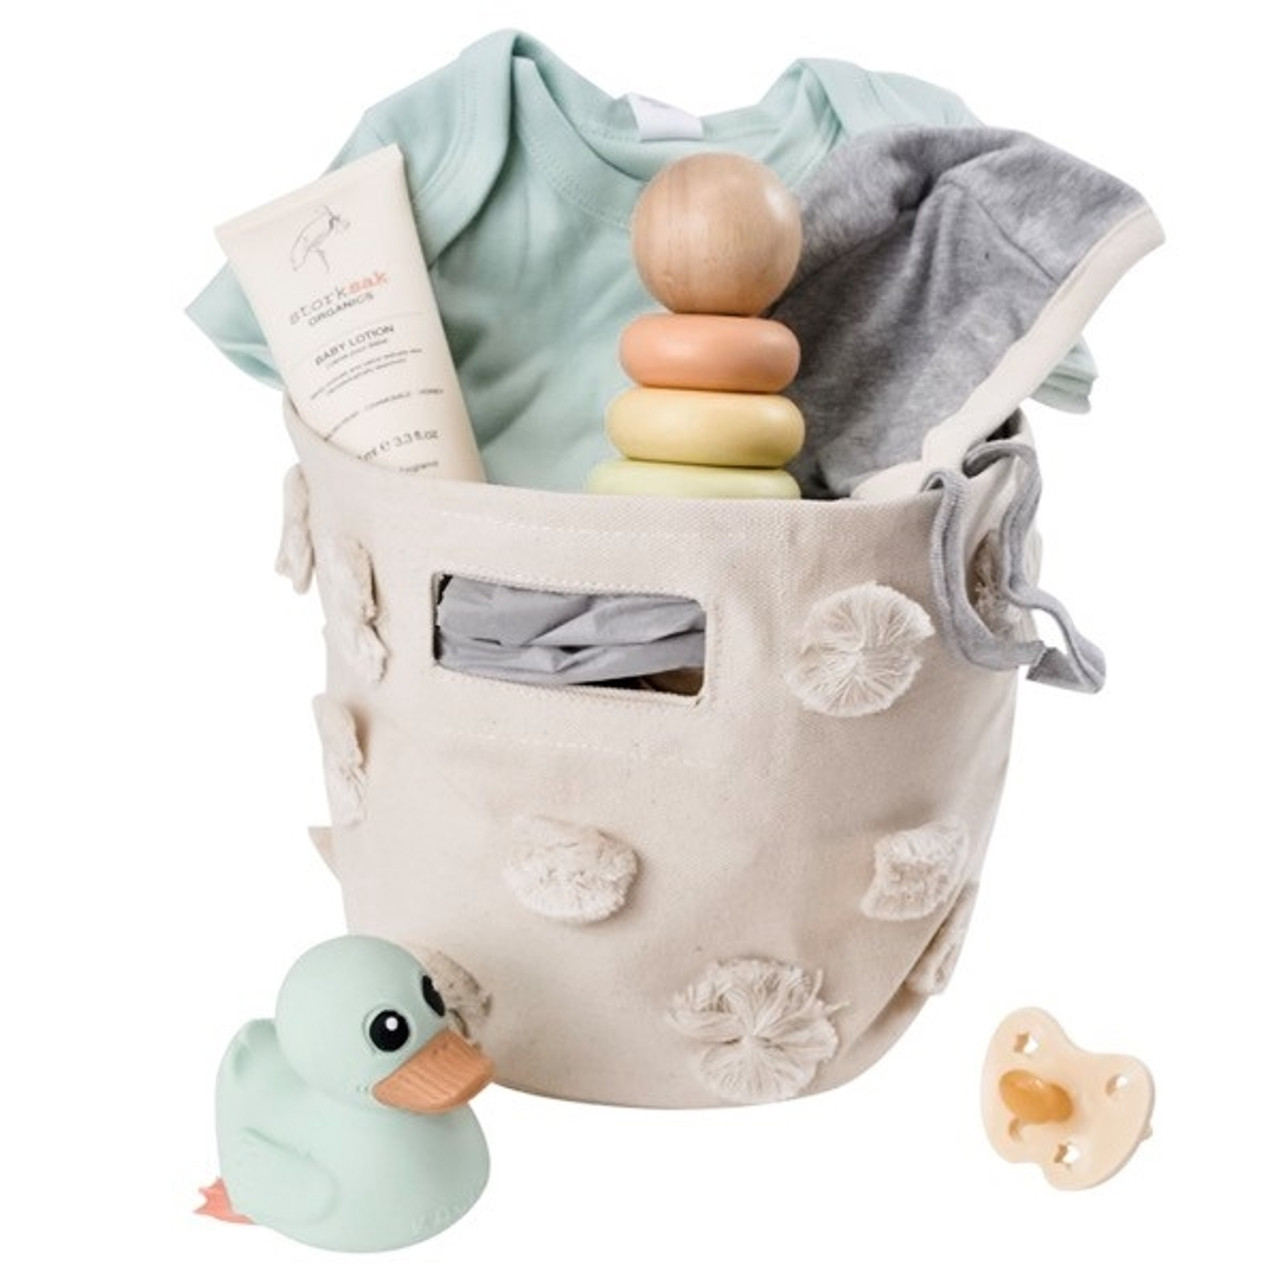 Organic Baby Gift Baskets - Sweet Mint